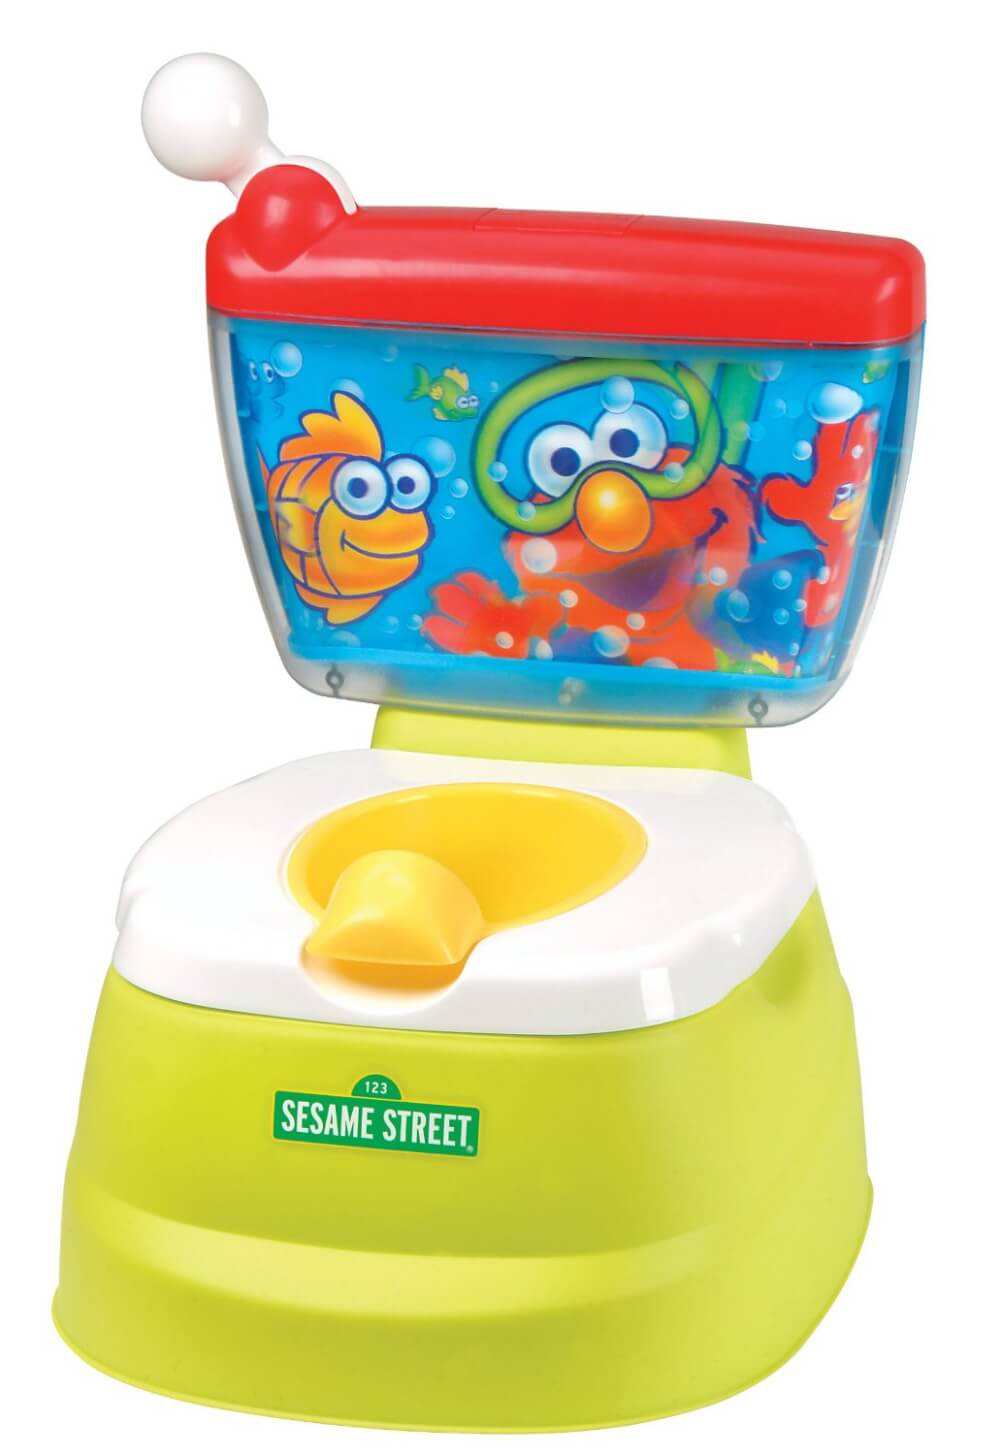 Sesame Street Elmo Adventure Potty Chair